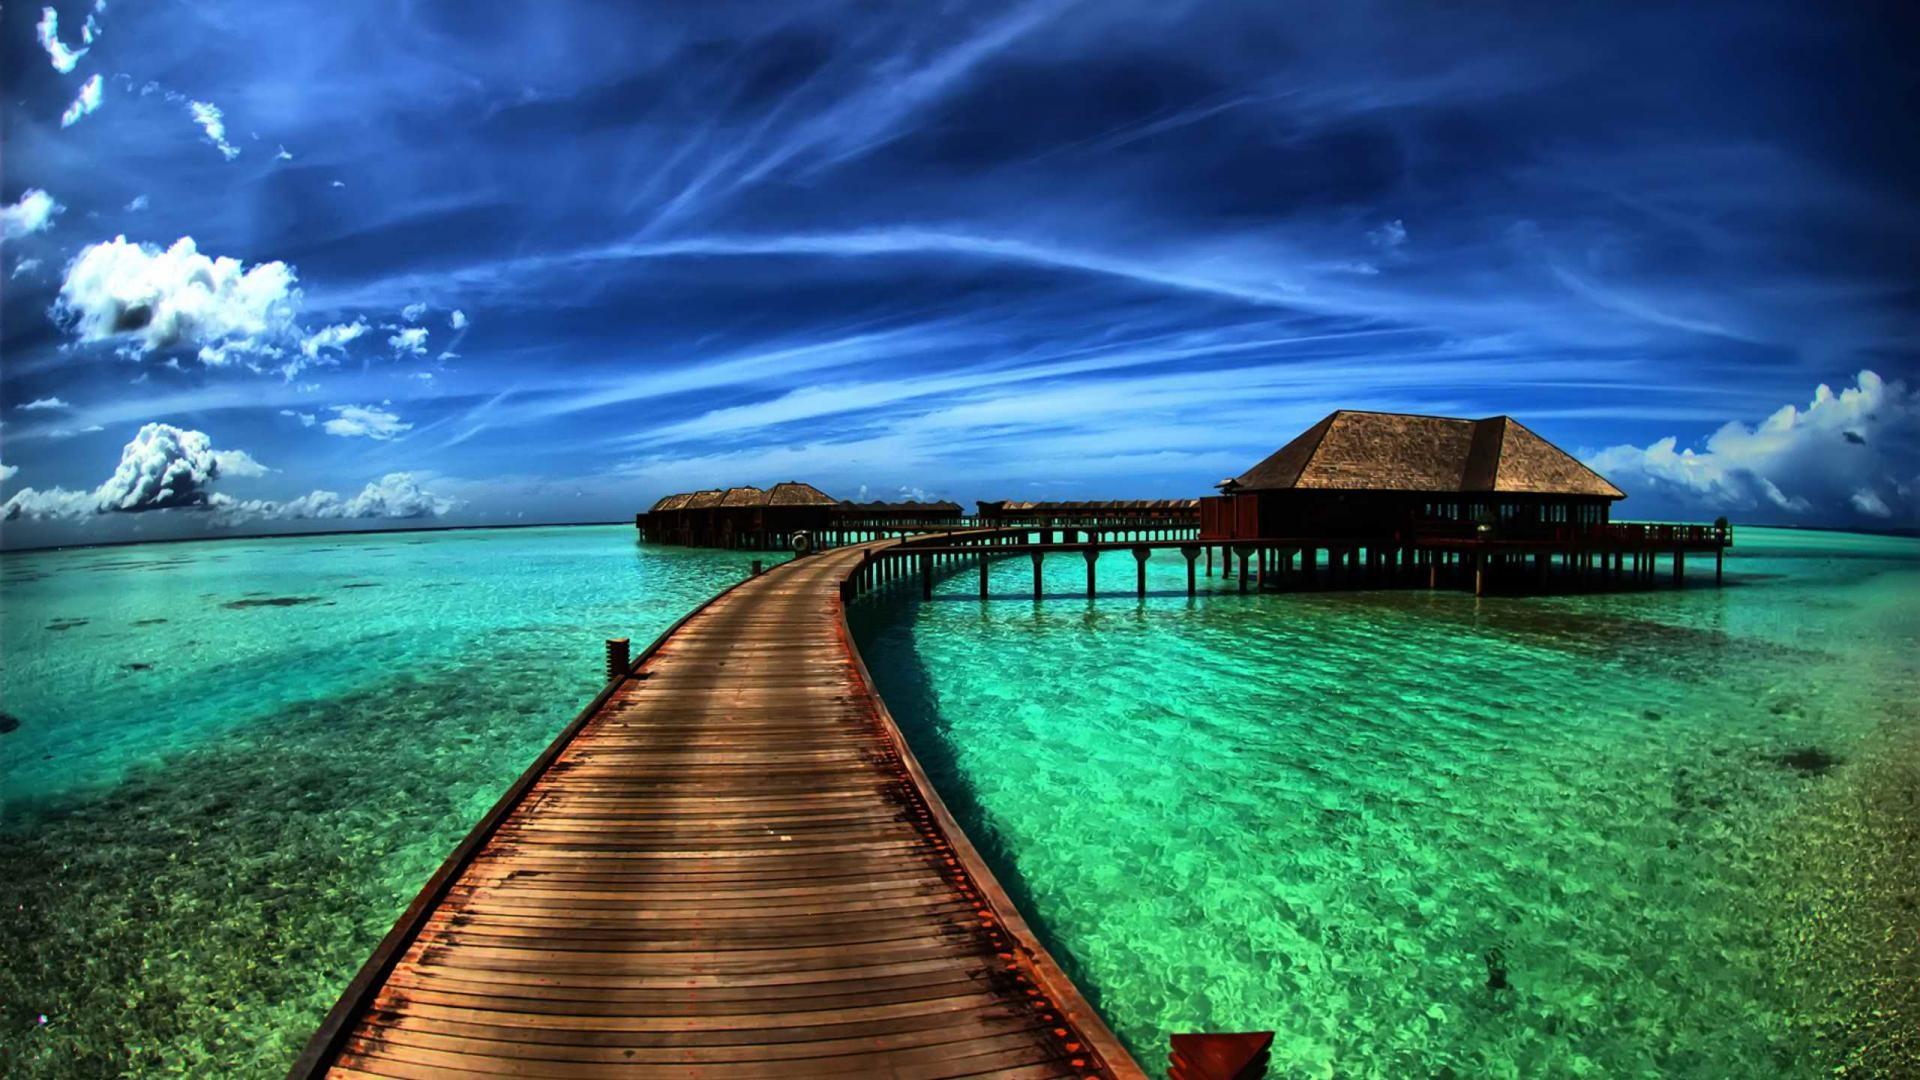 Download Best Beach Background Wallpaper | Full HD Wallpapers